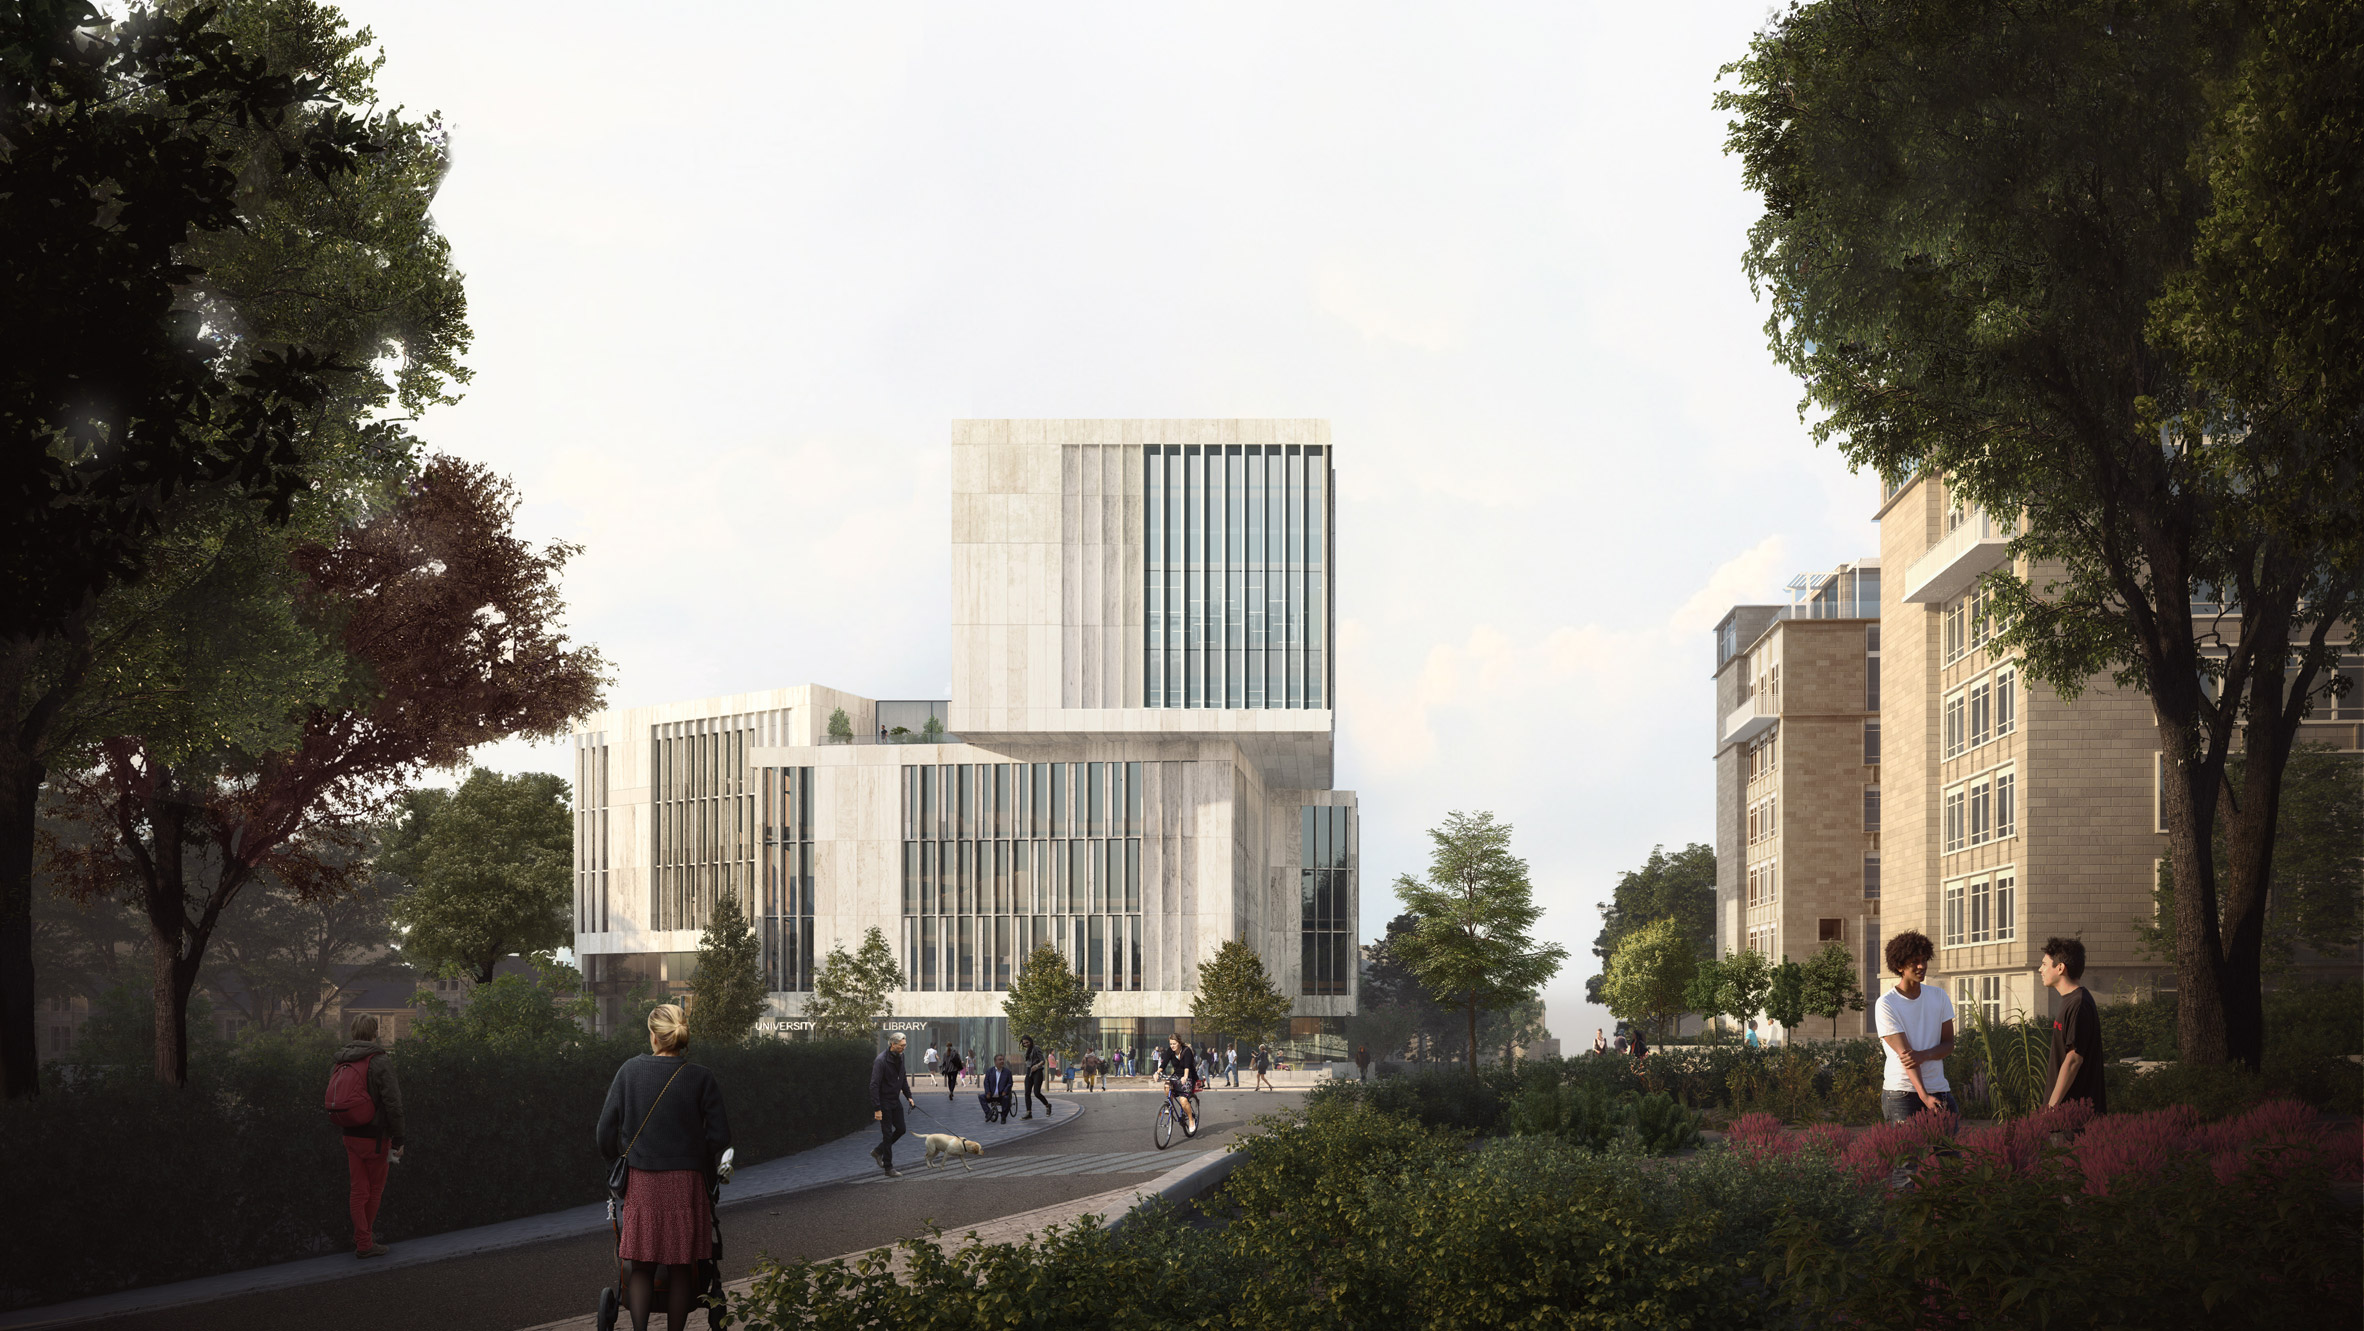 New University Library by Hawkins/Brown and Schmidt Hammer Lassen